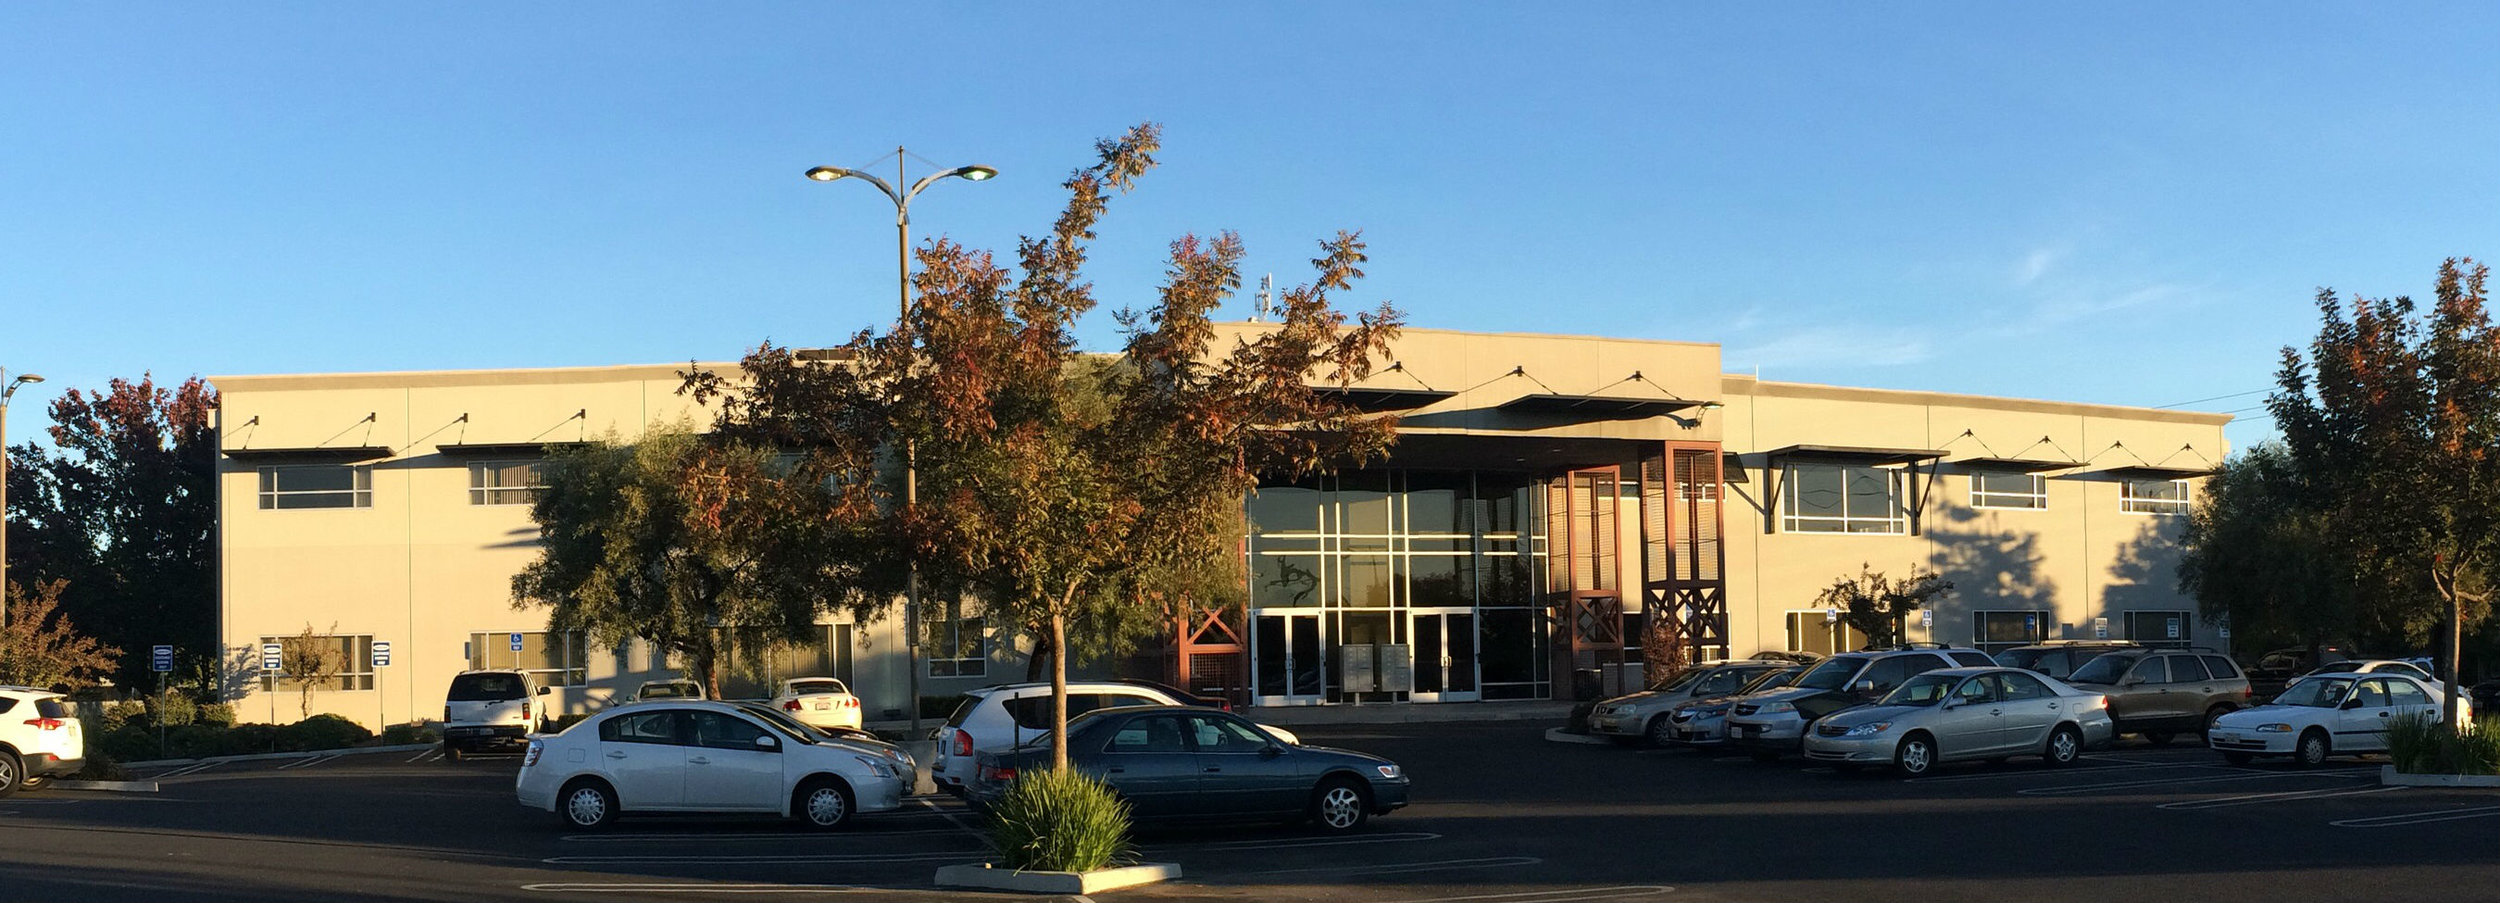 4712 Stoddard Rd, Modesto, CA -